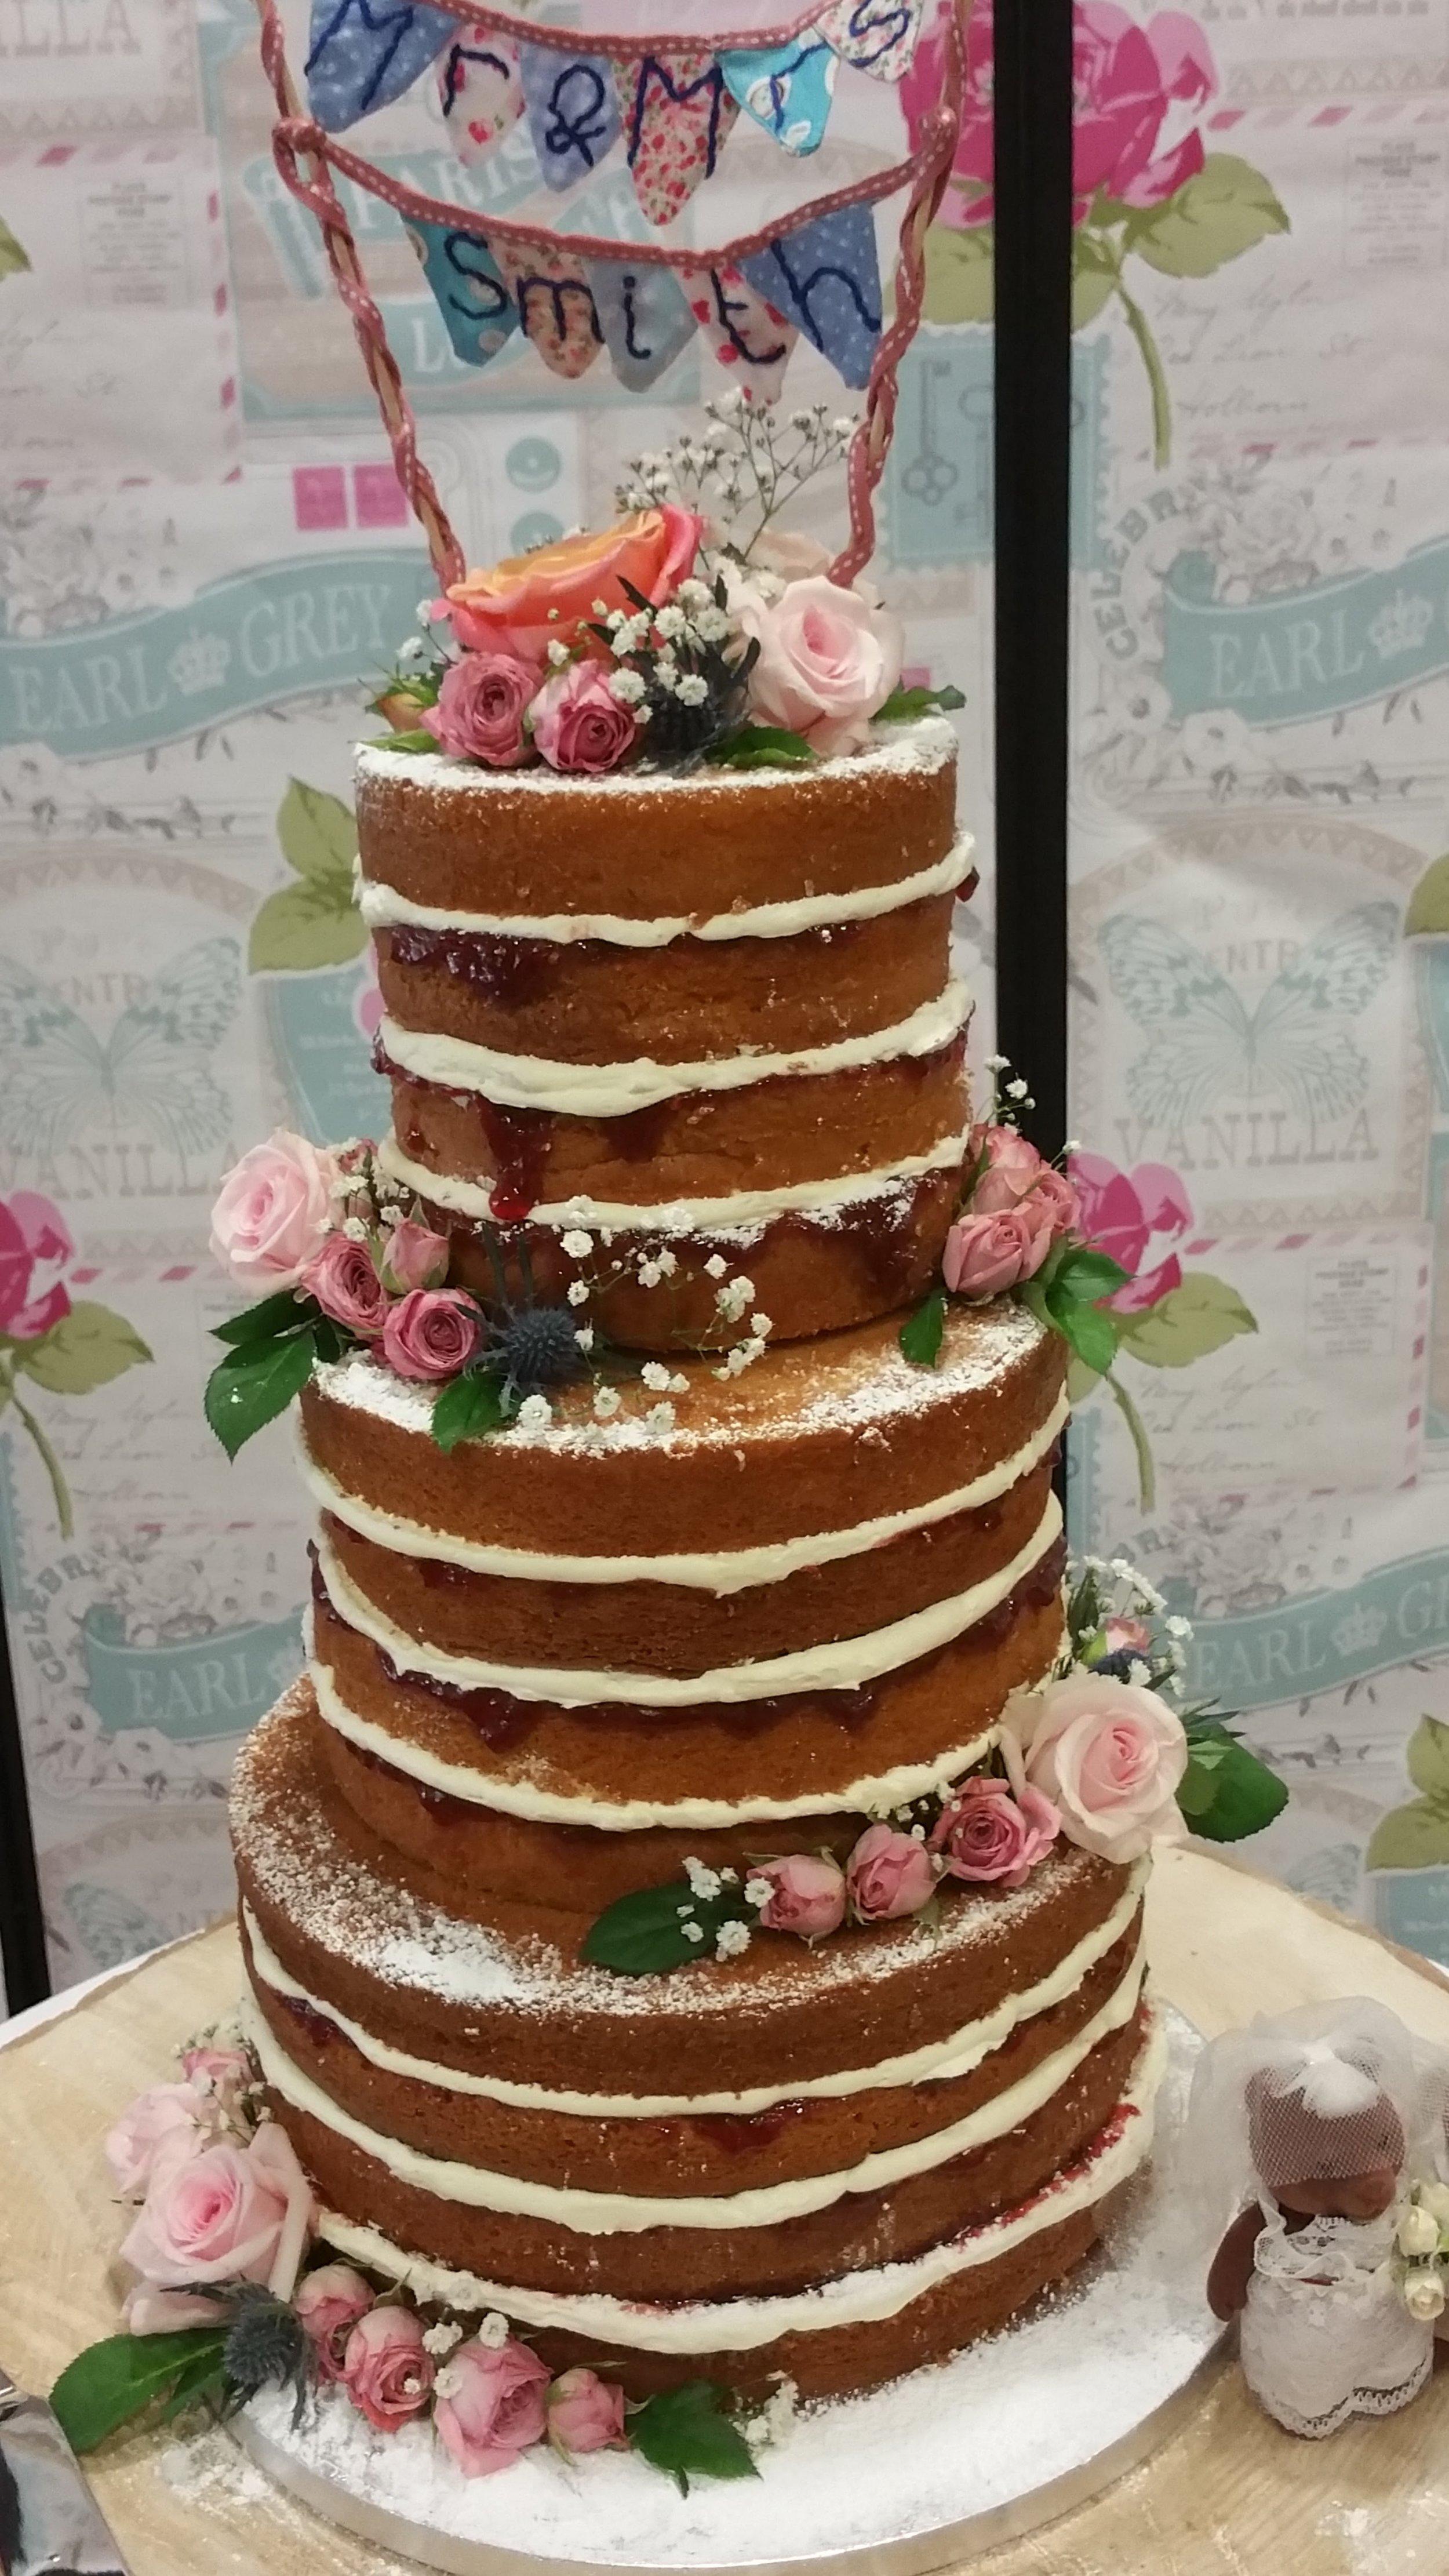 Naked sponge cake - Scrumpious 3 tier, 4 layer, Madagascan vanilla sponge cake with strawberry jam and whipped vanilla buttercream.